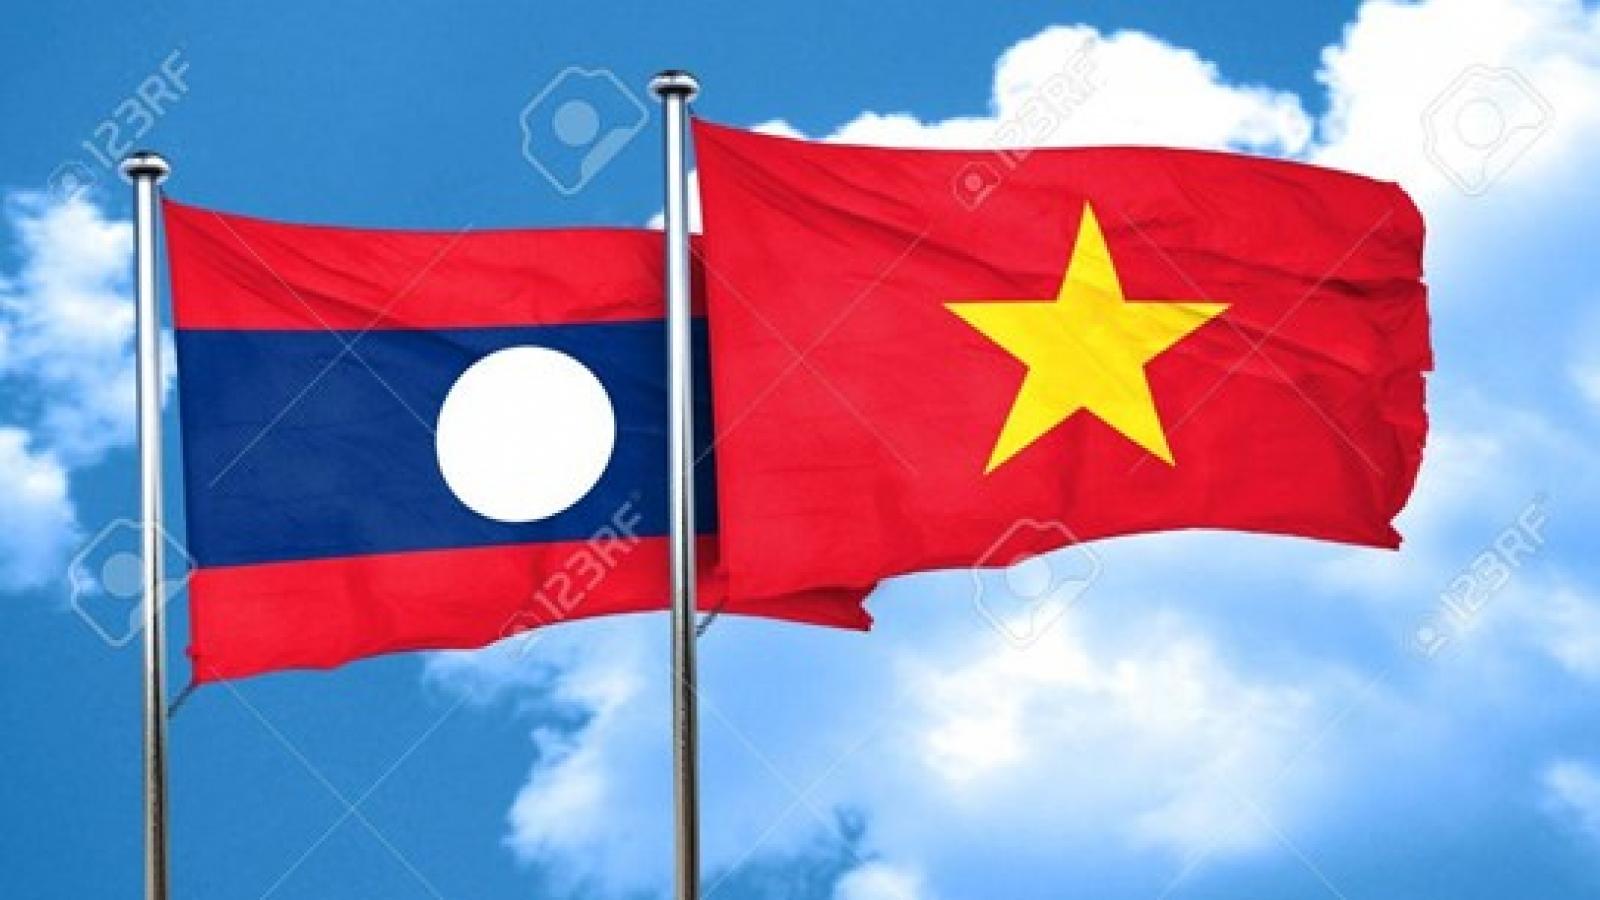 Congratulations to Laos' National Party Congress